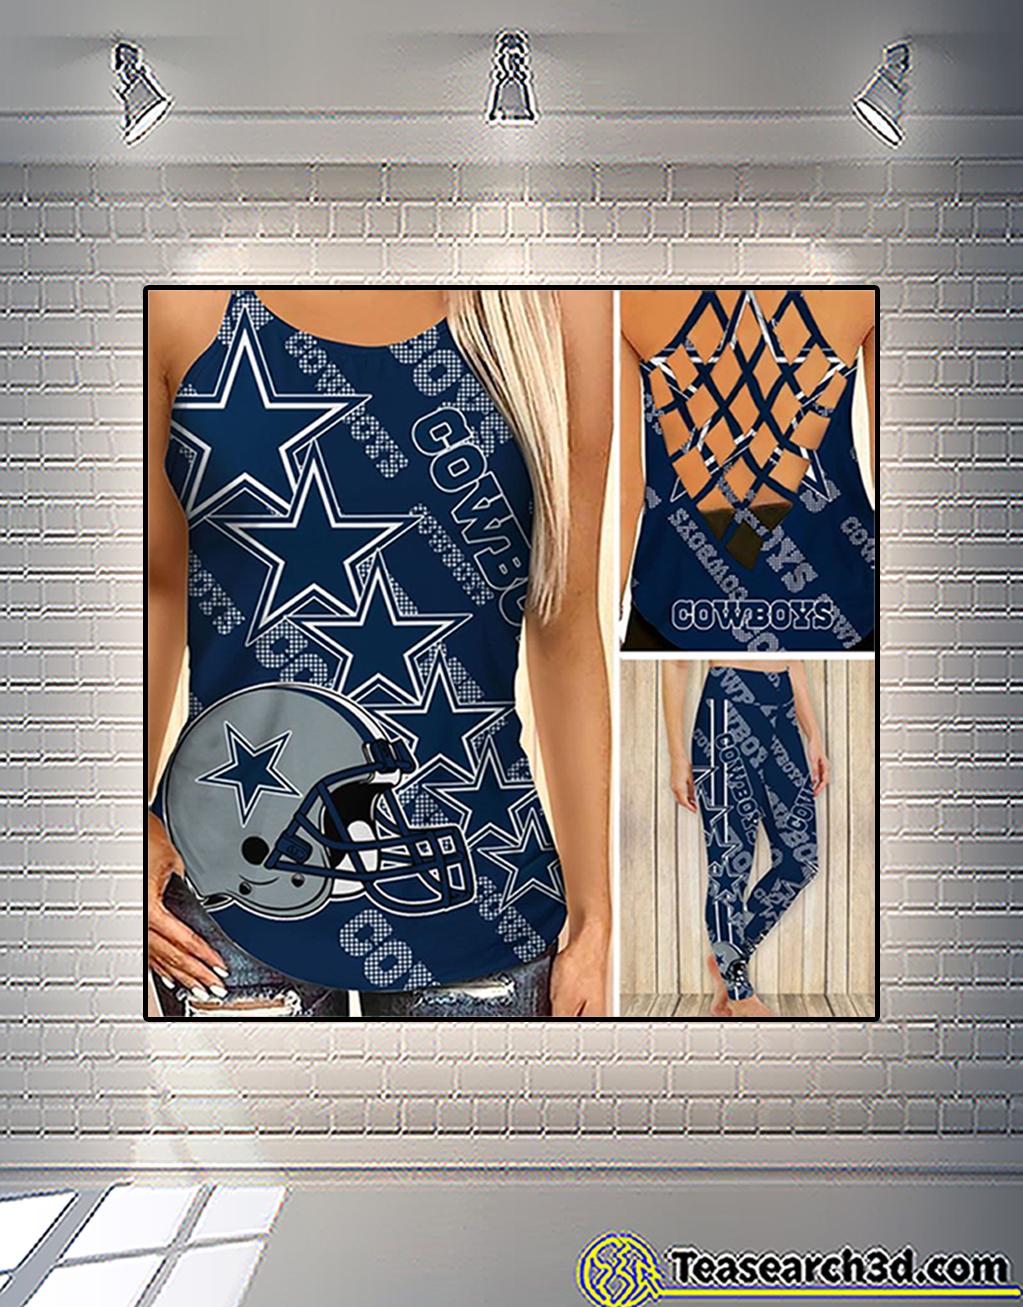 Dallas cowboys criss cross tank top and leggings